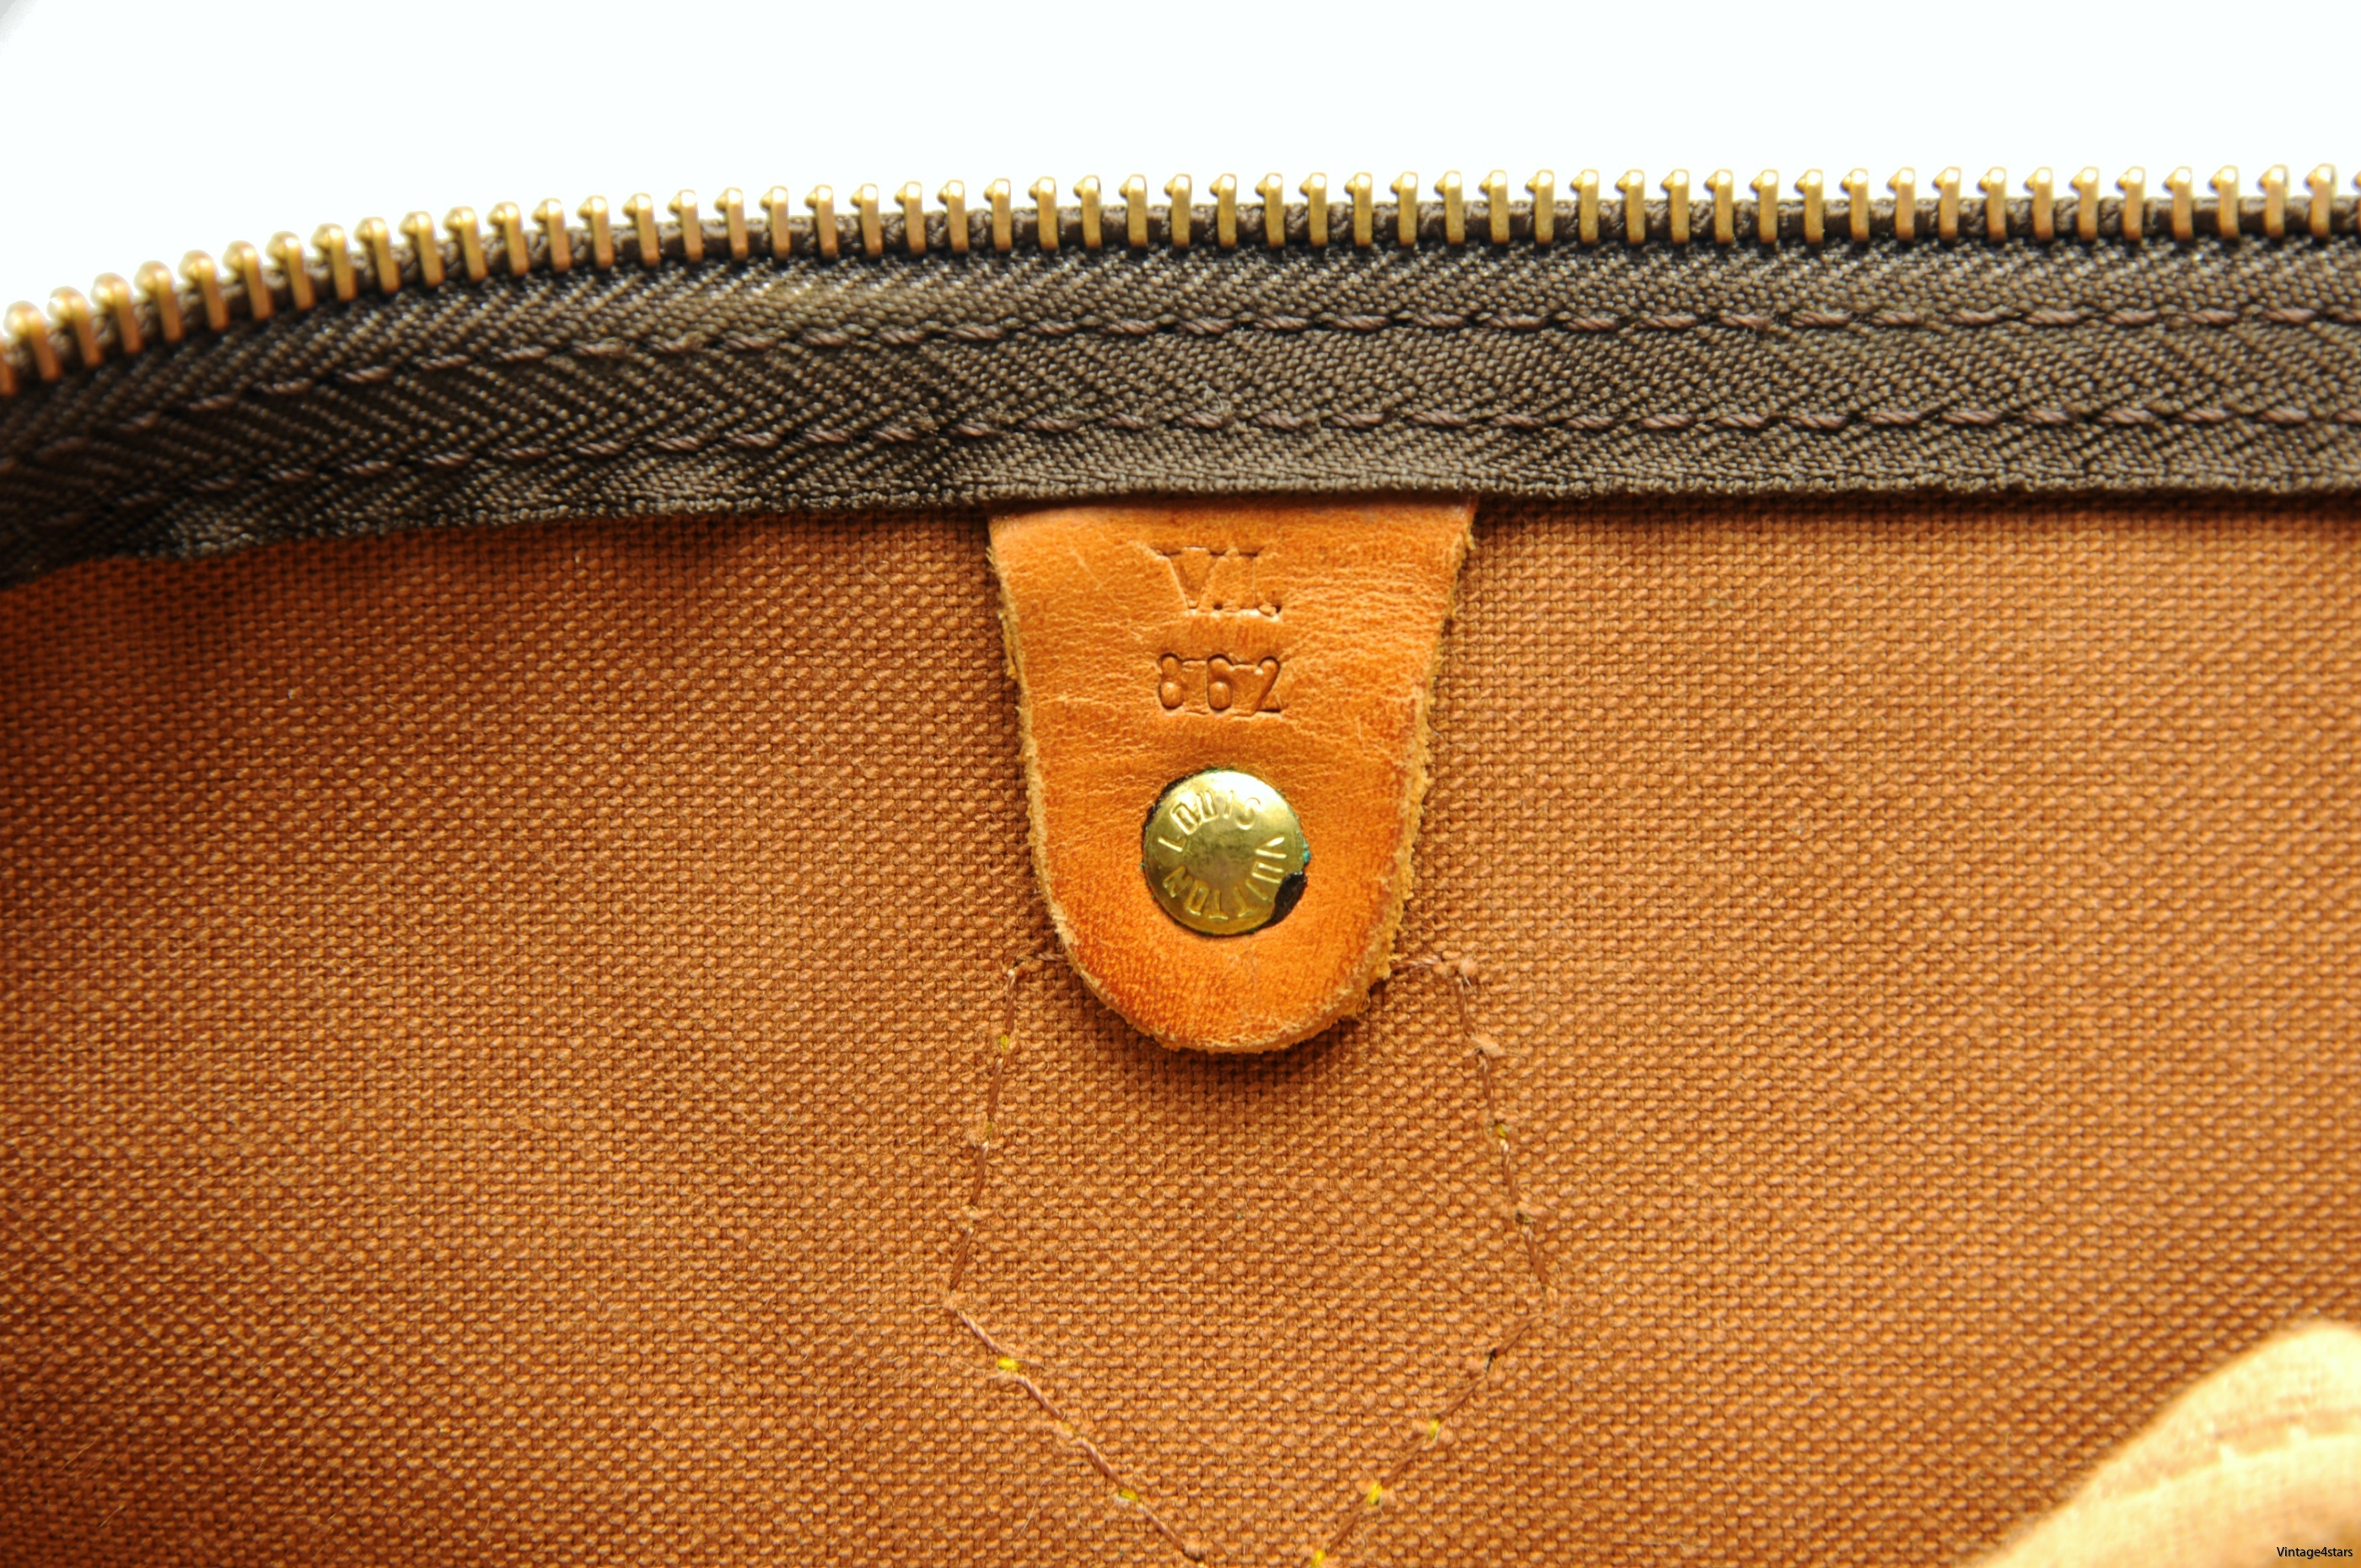 Louis Vuitton Speedy 35 Monogram 12